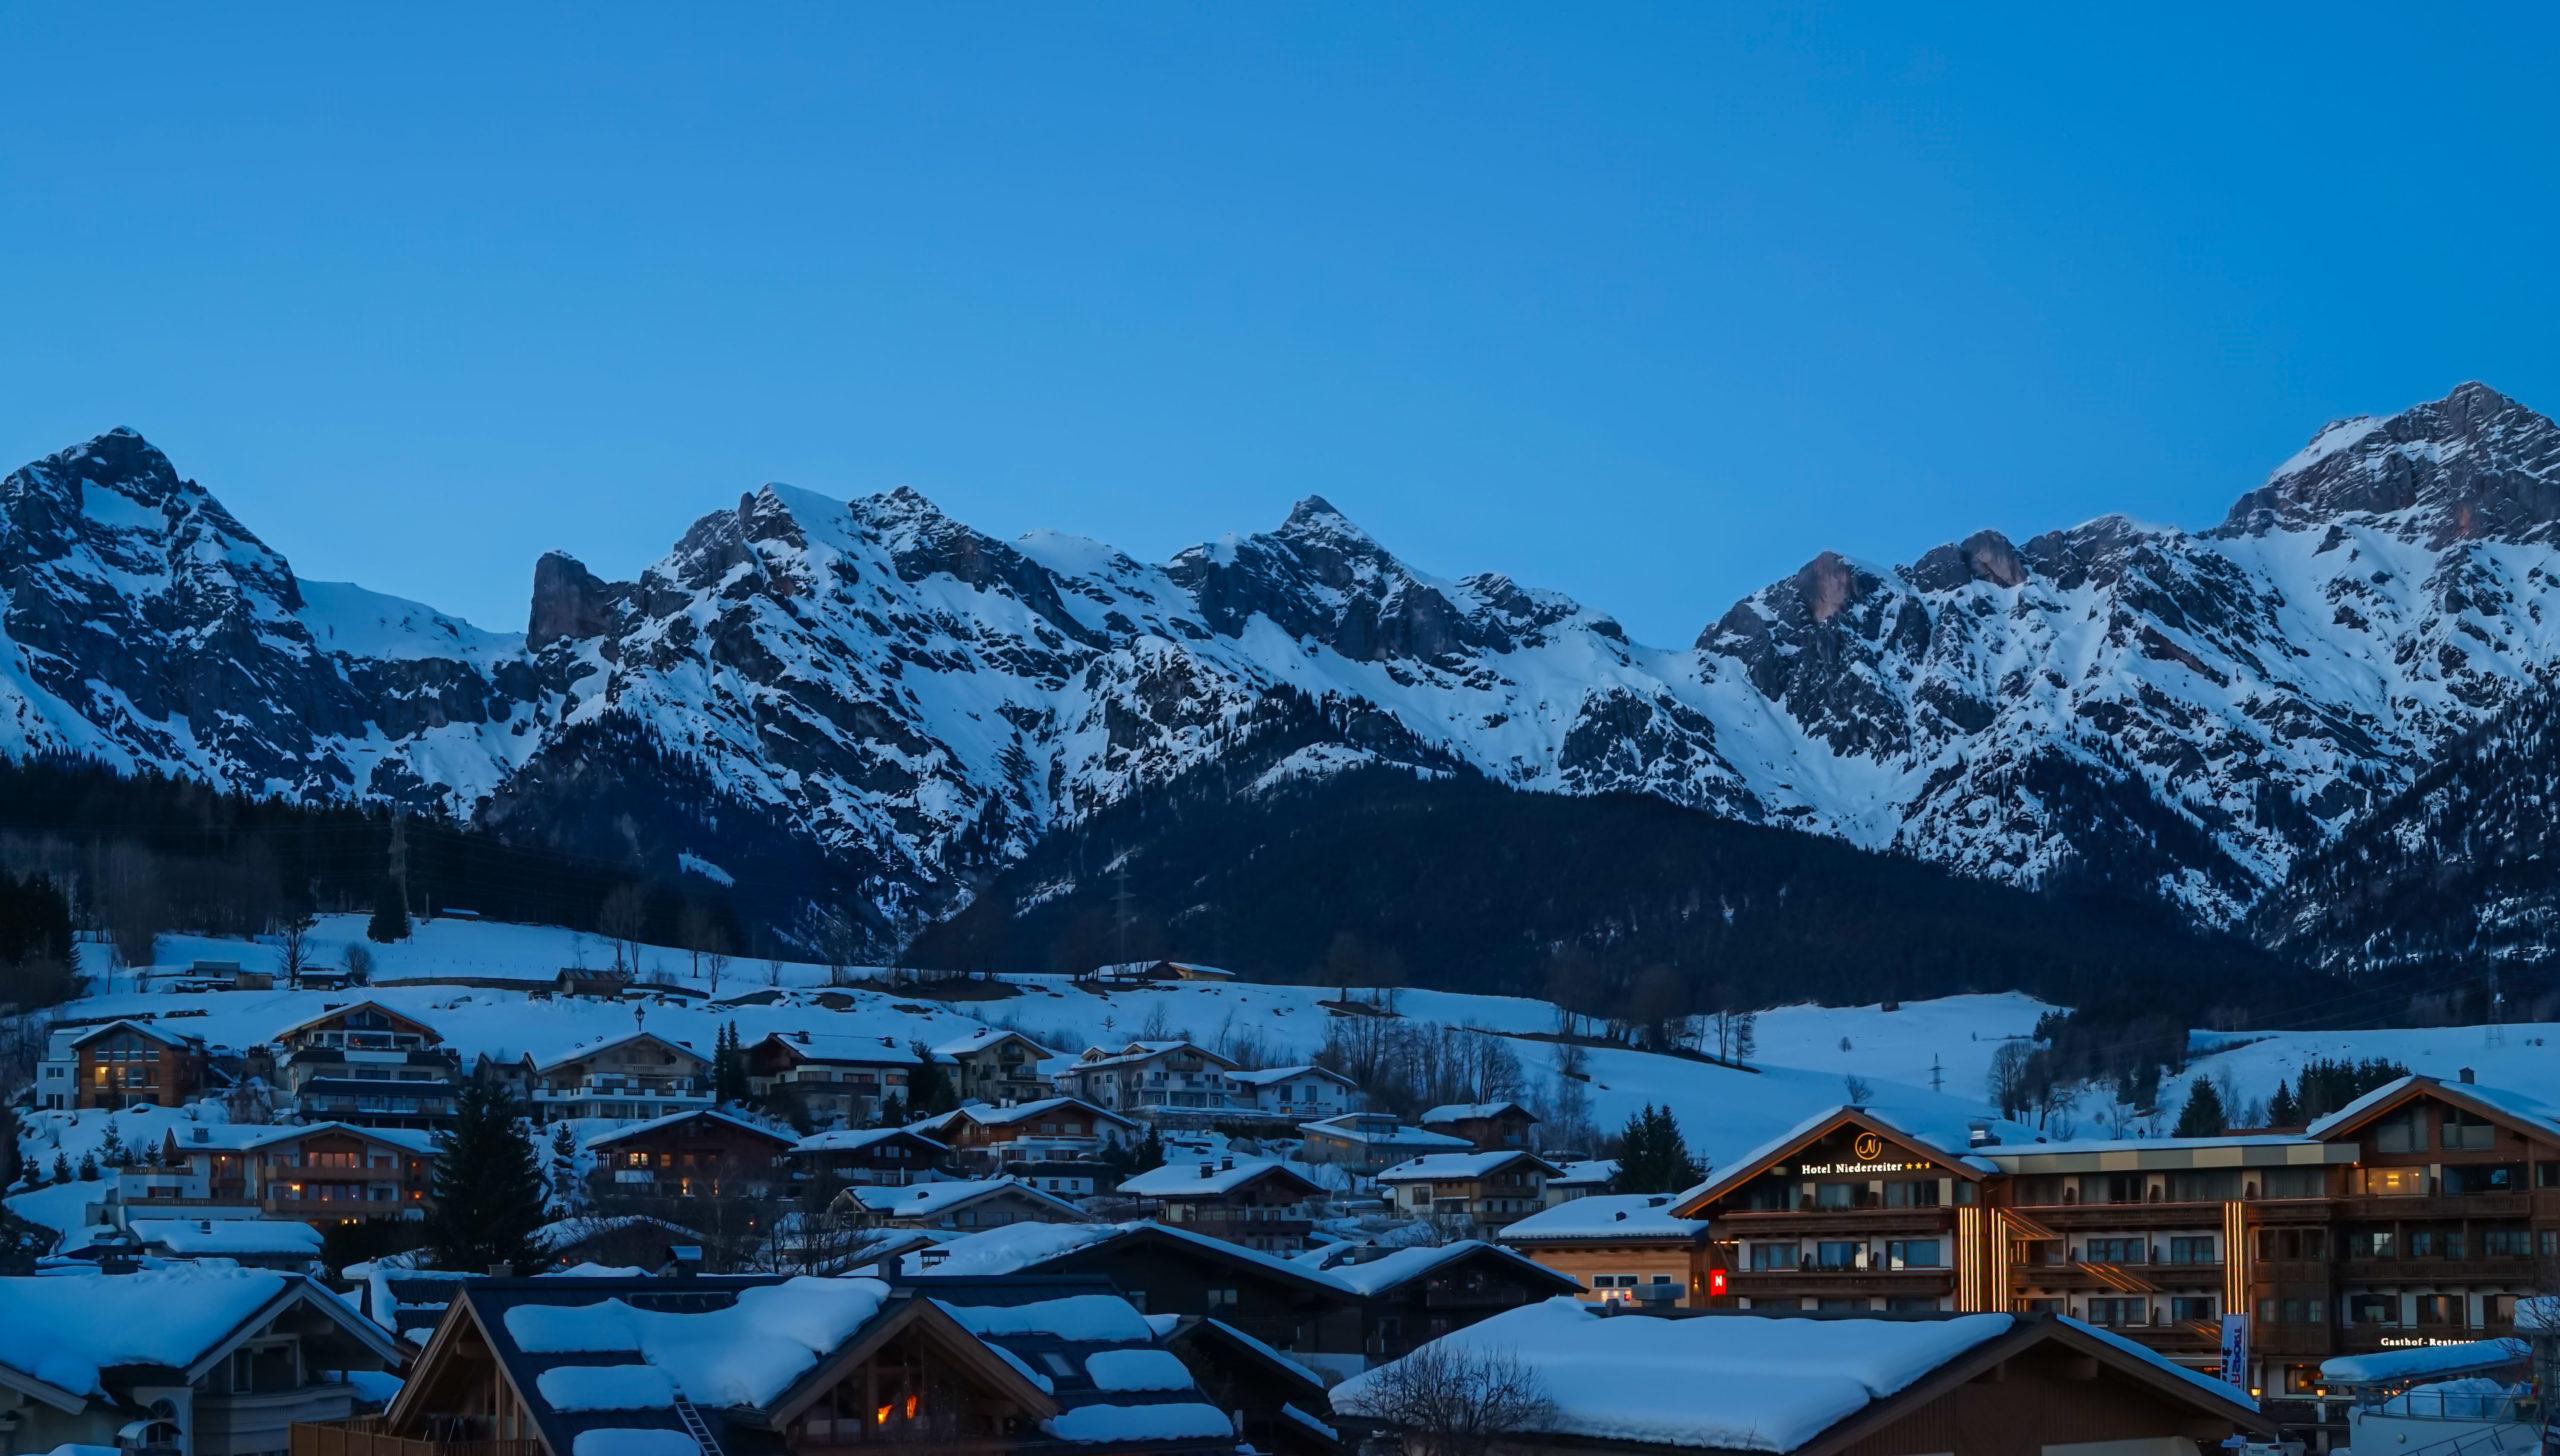 Alpen, Maria Alm, Feierabend